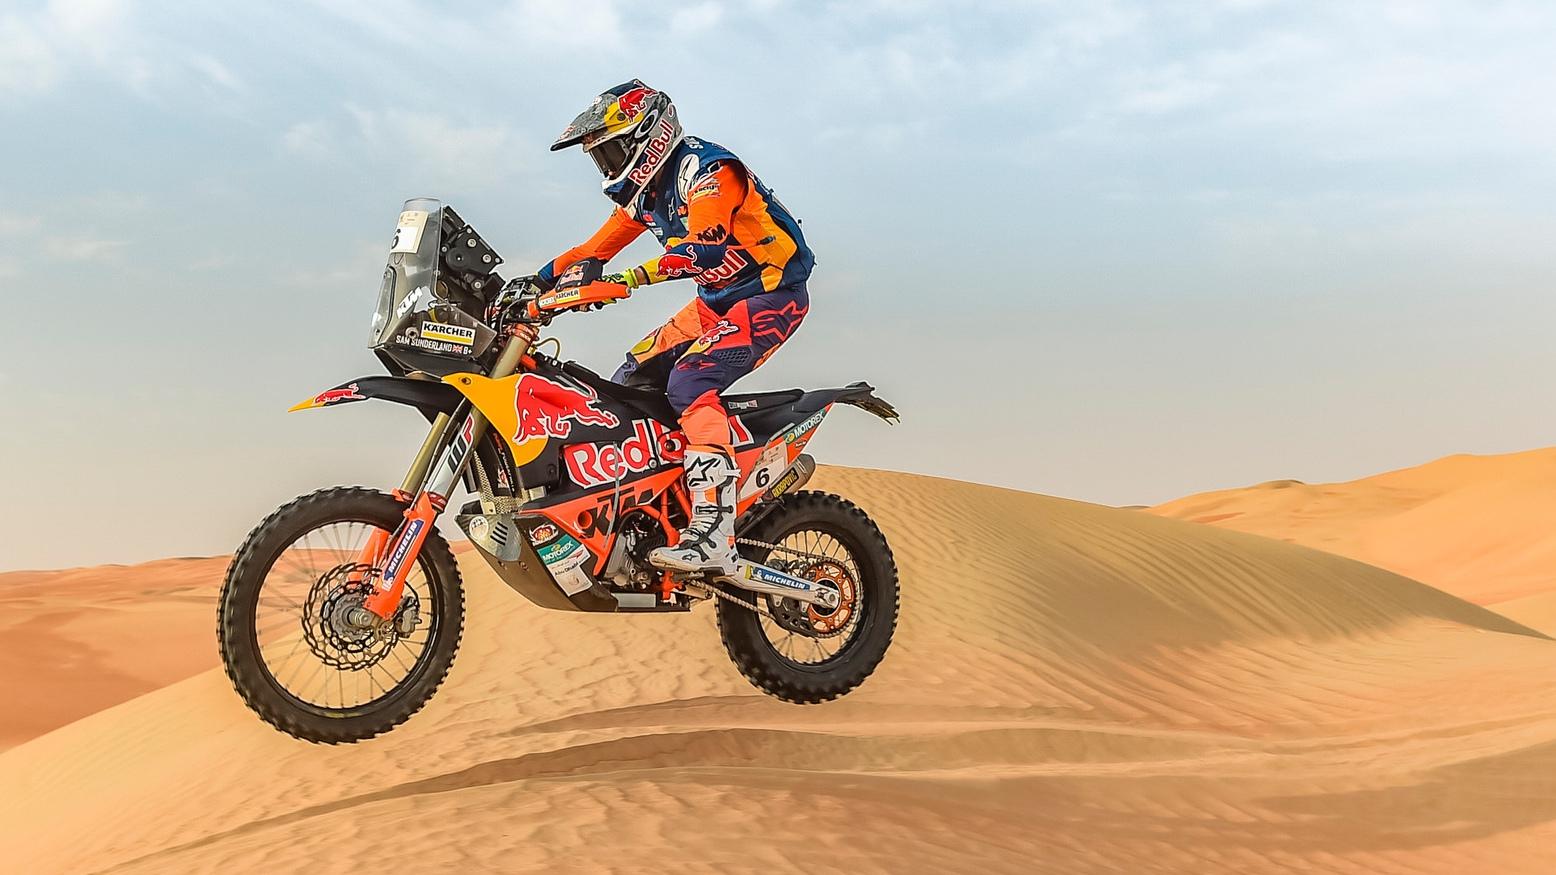 Sam Sunderland gana el Abu Dhabi Desert Challenge y ya lidera el Mundial de Rallies 2019